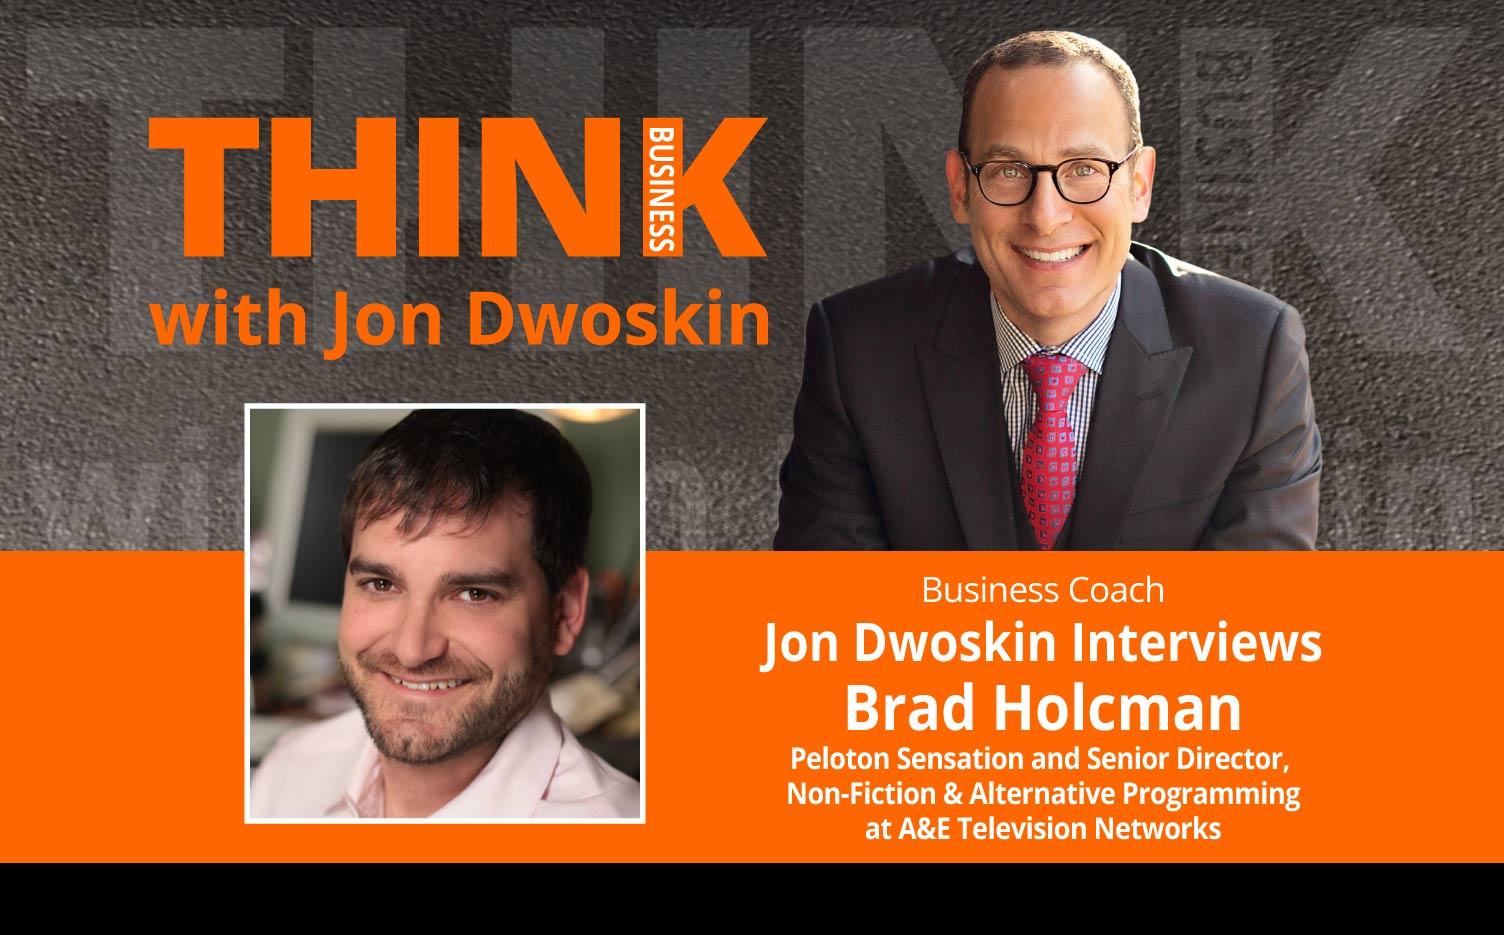 THINK Business Podcast: Jon Dwoskin Interviews Brad Holcman Peloton Sensation and Senior Director, Non-Fiction & Alternative Programming at A&E Television Networks